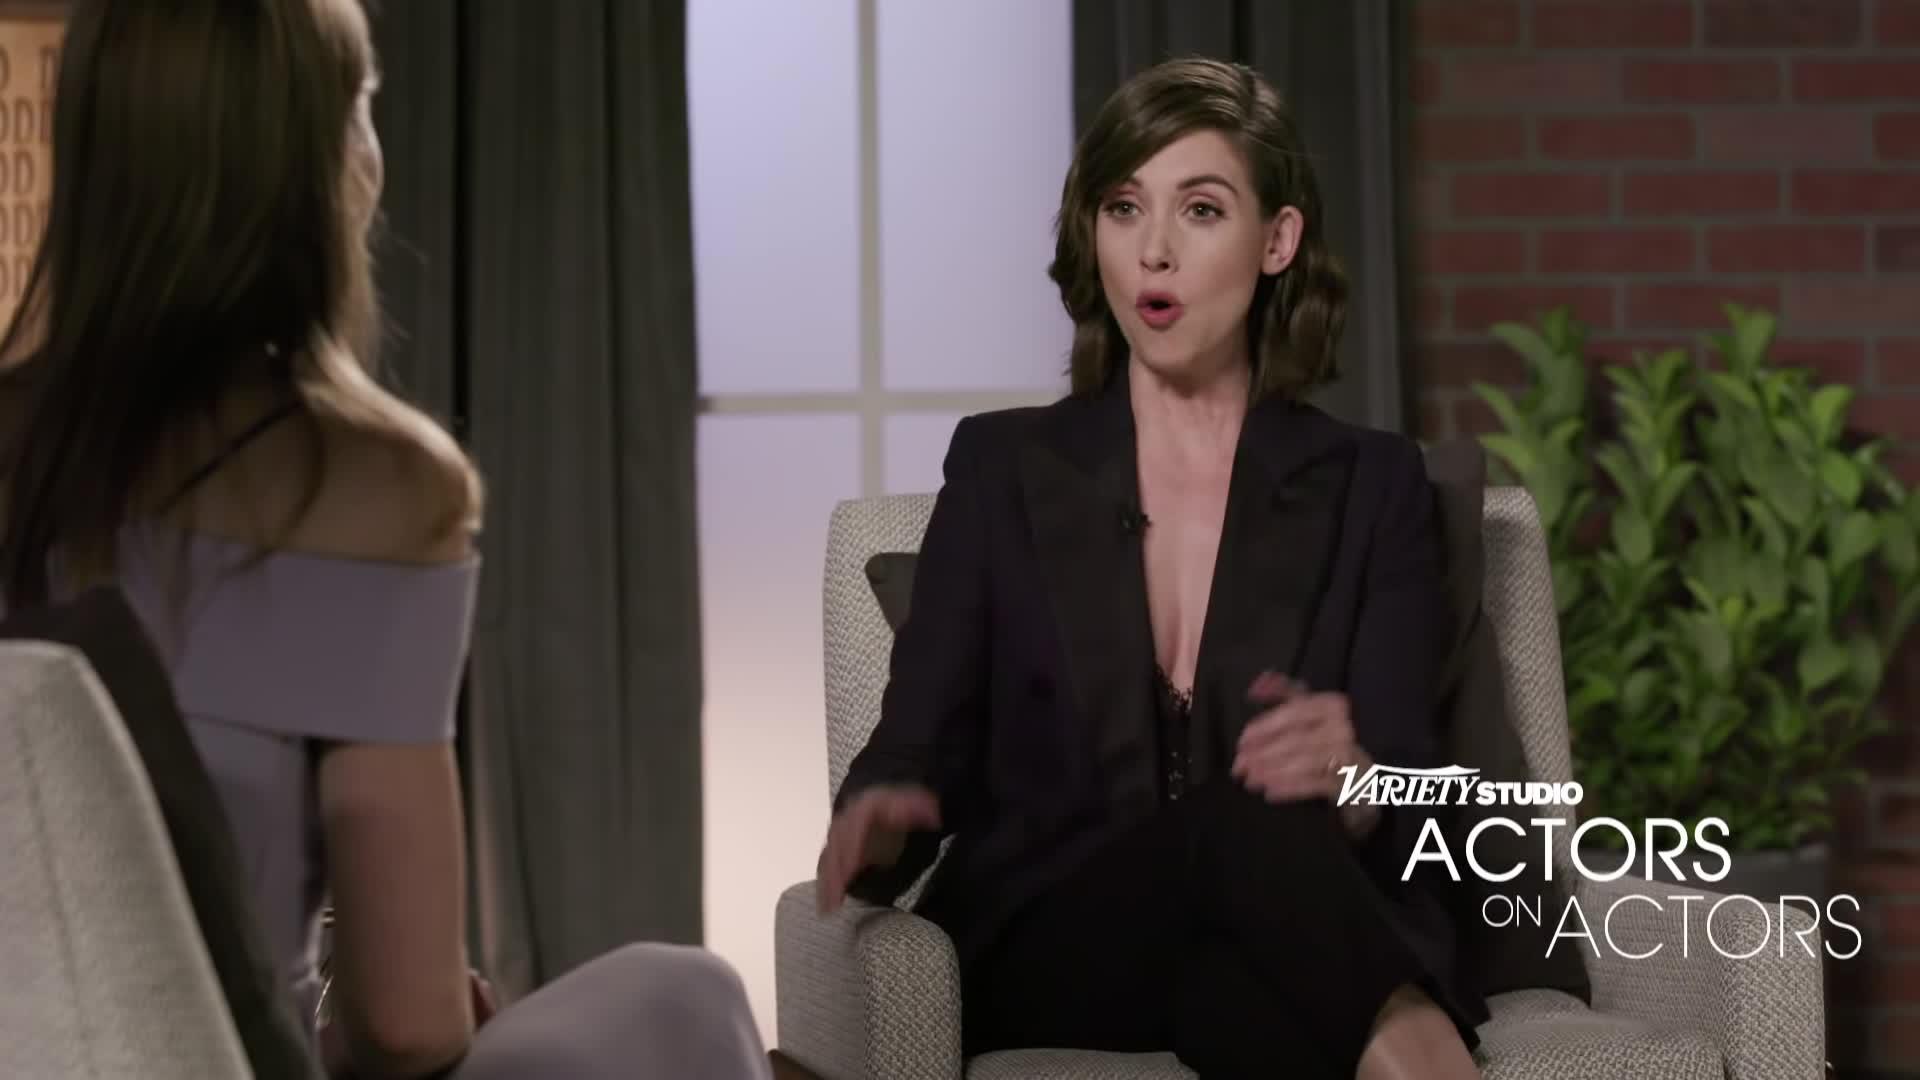 Alison Brie, ladies in suits, ladiesinsuits, women in suits, Alison Brie & Jessica Biel Full - Full Actors on Actors Discussion GIFs